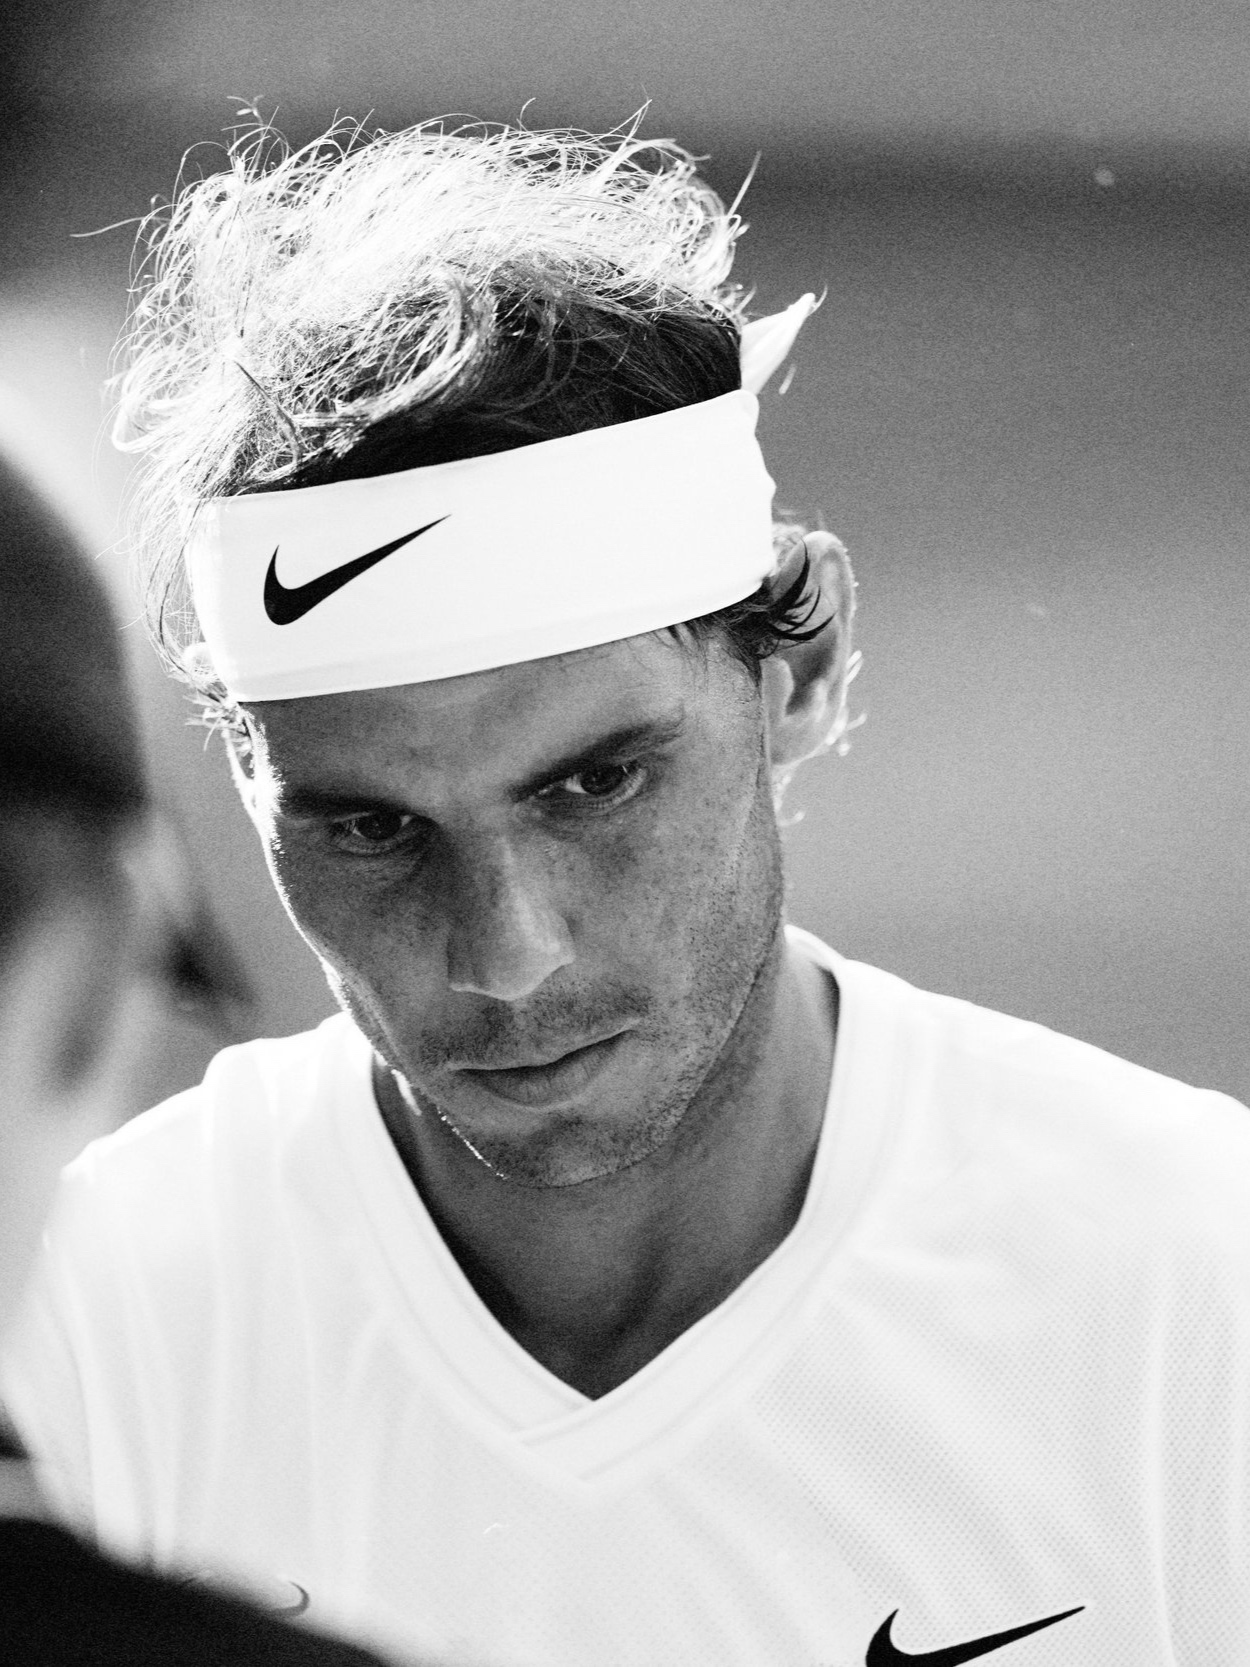 Wimbledon_New_York_Times_Stockdale65.jpg